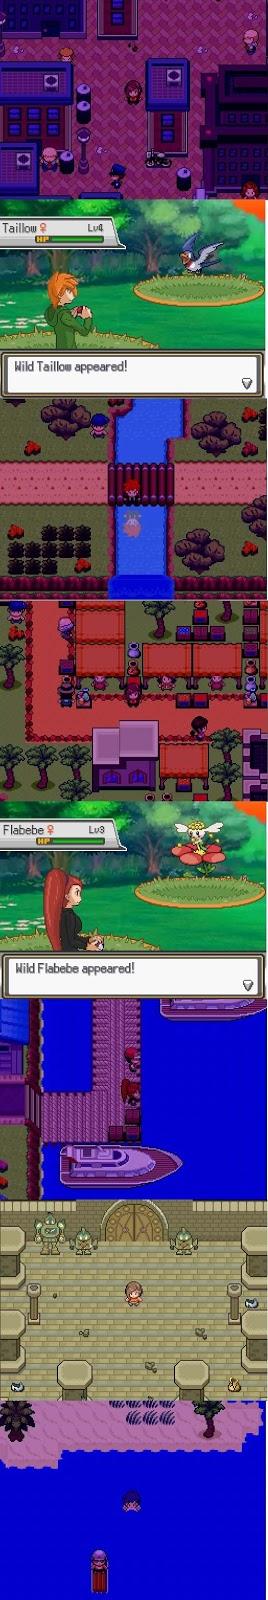 Pokemon Archaic Legacy